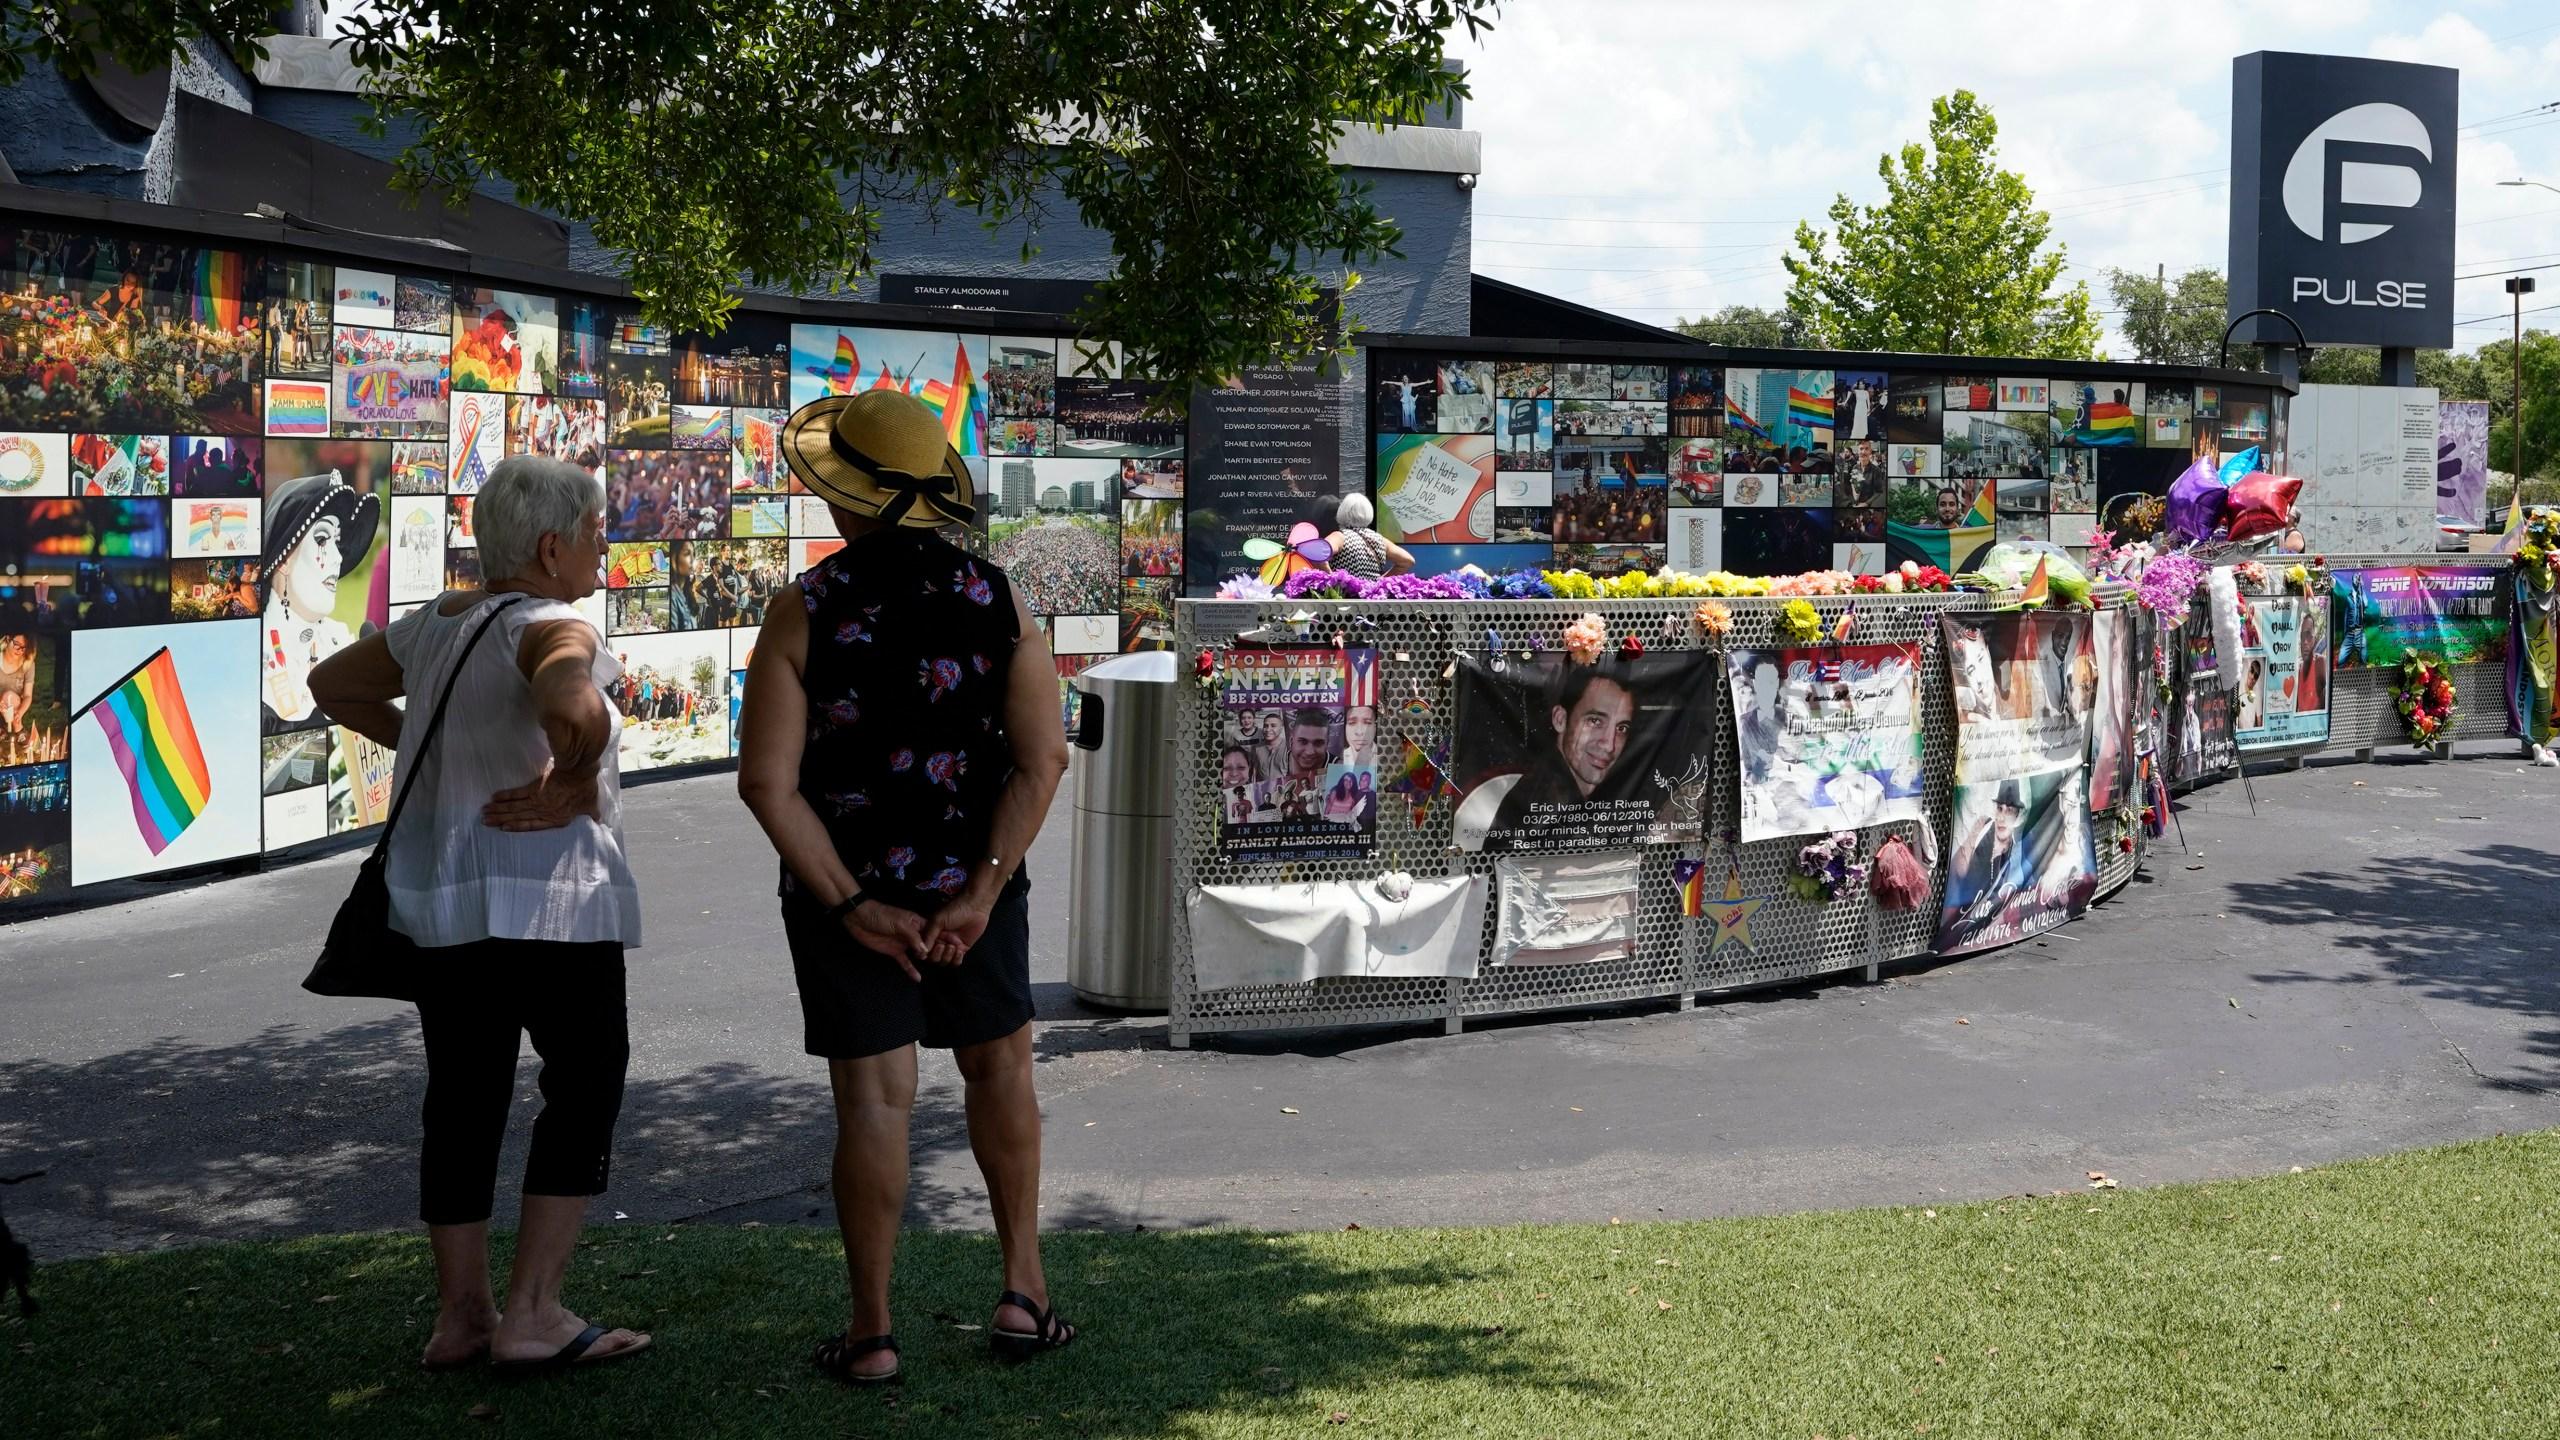 Site of the Pulse nightclub massacre